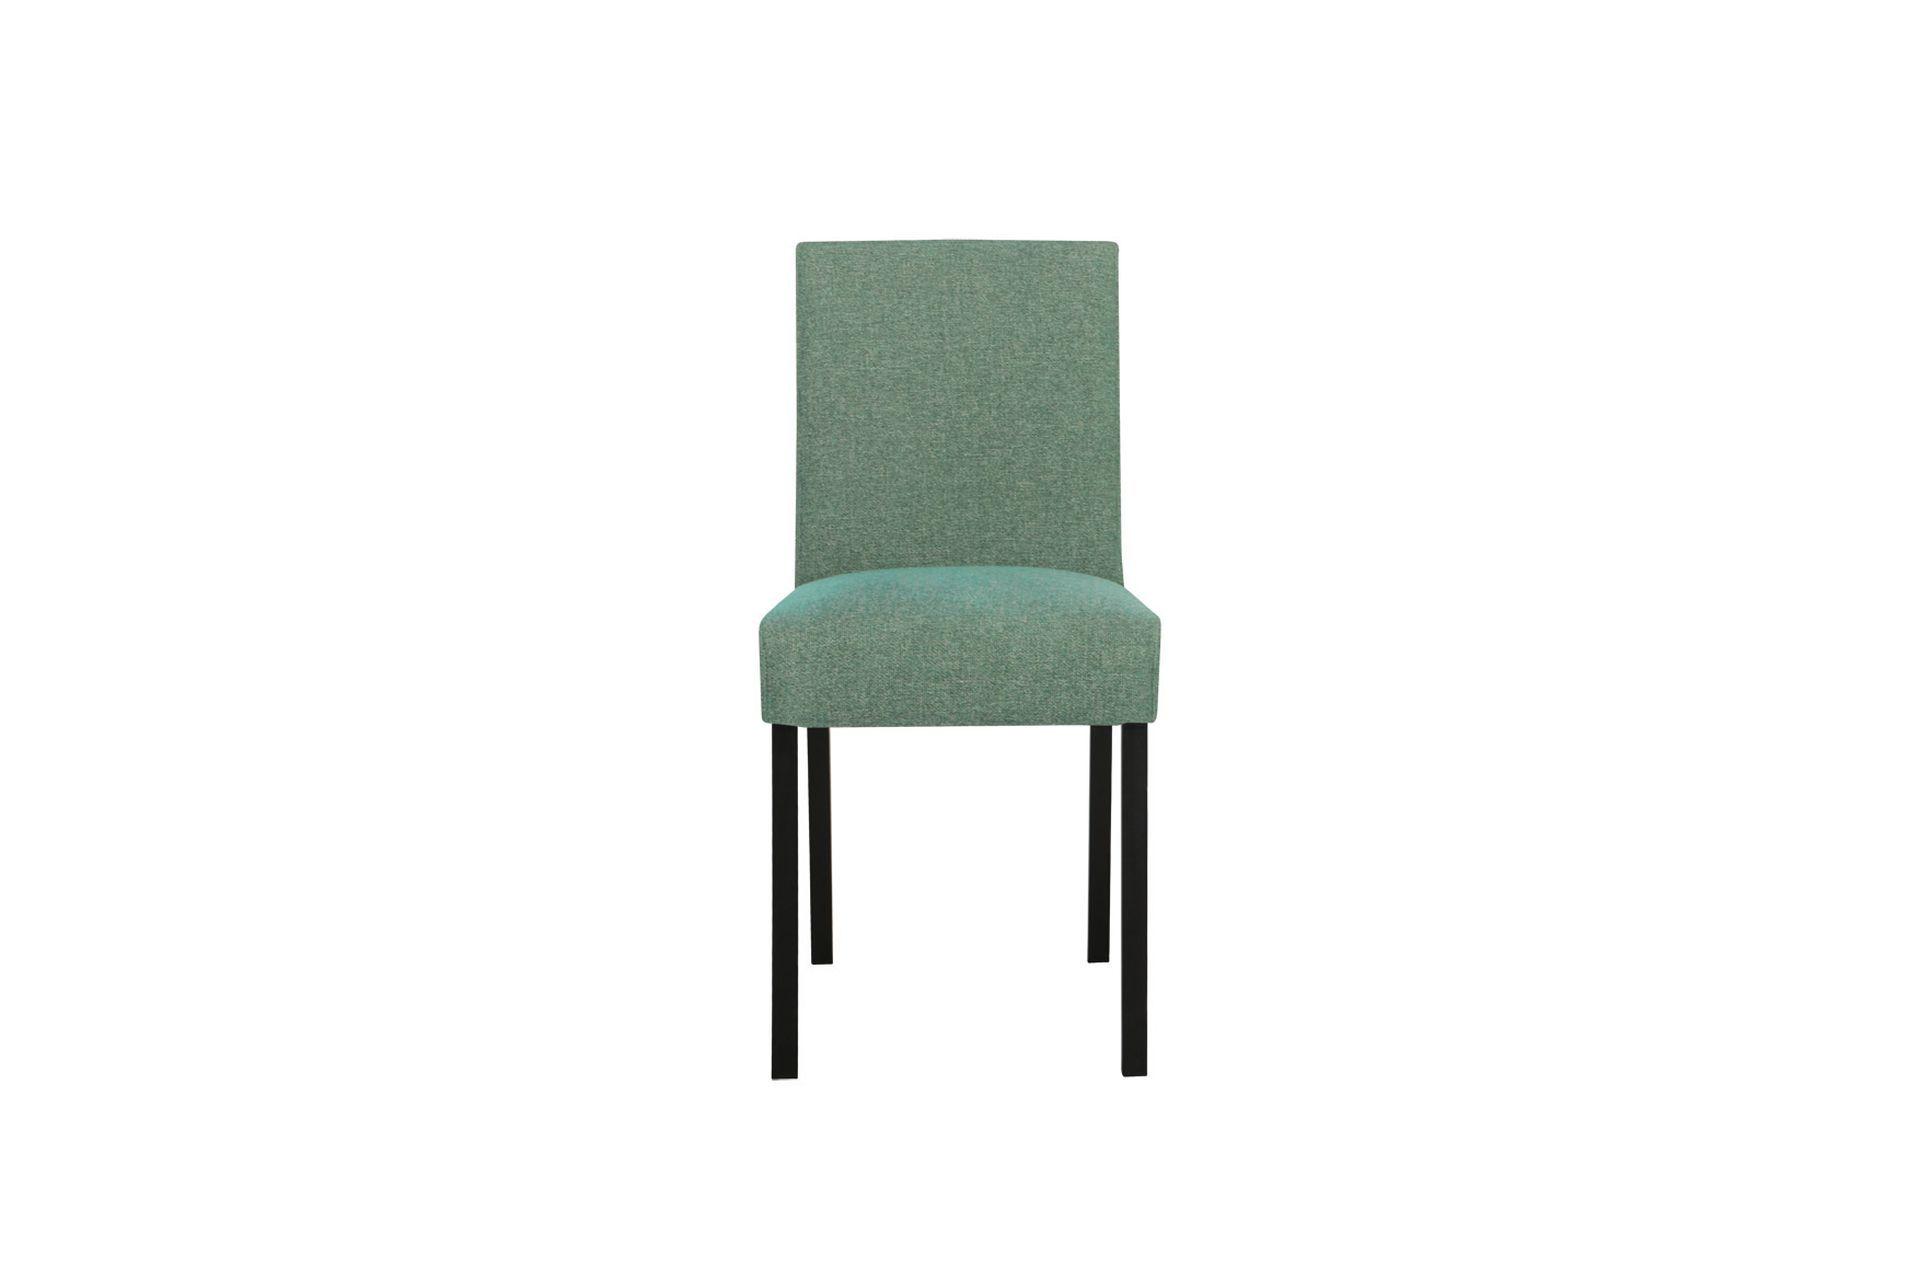 Кухонный стул Sits 15447053 от thefurnish